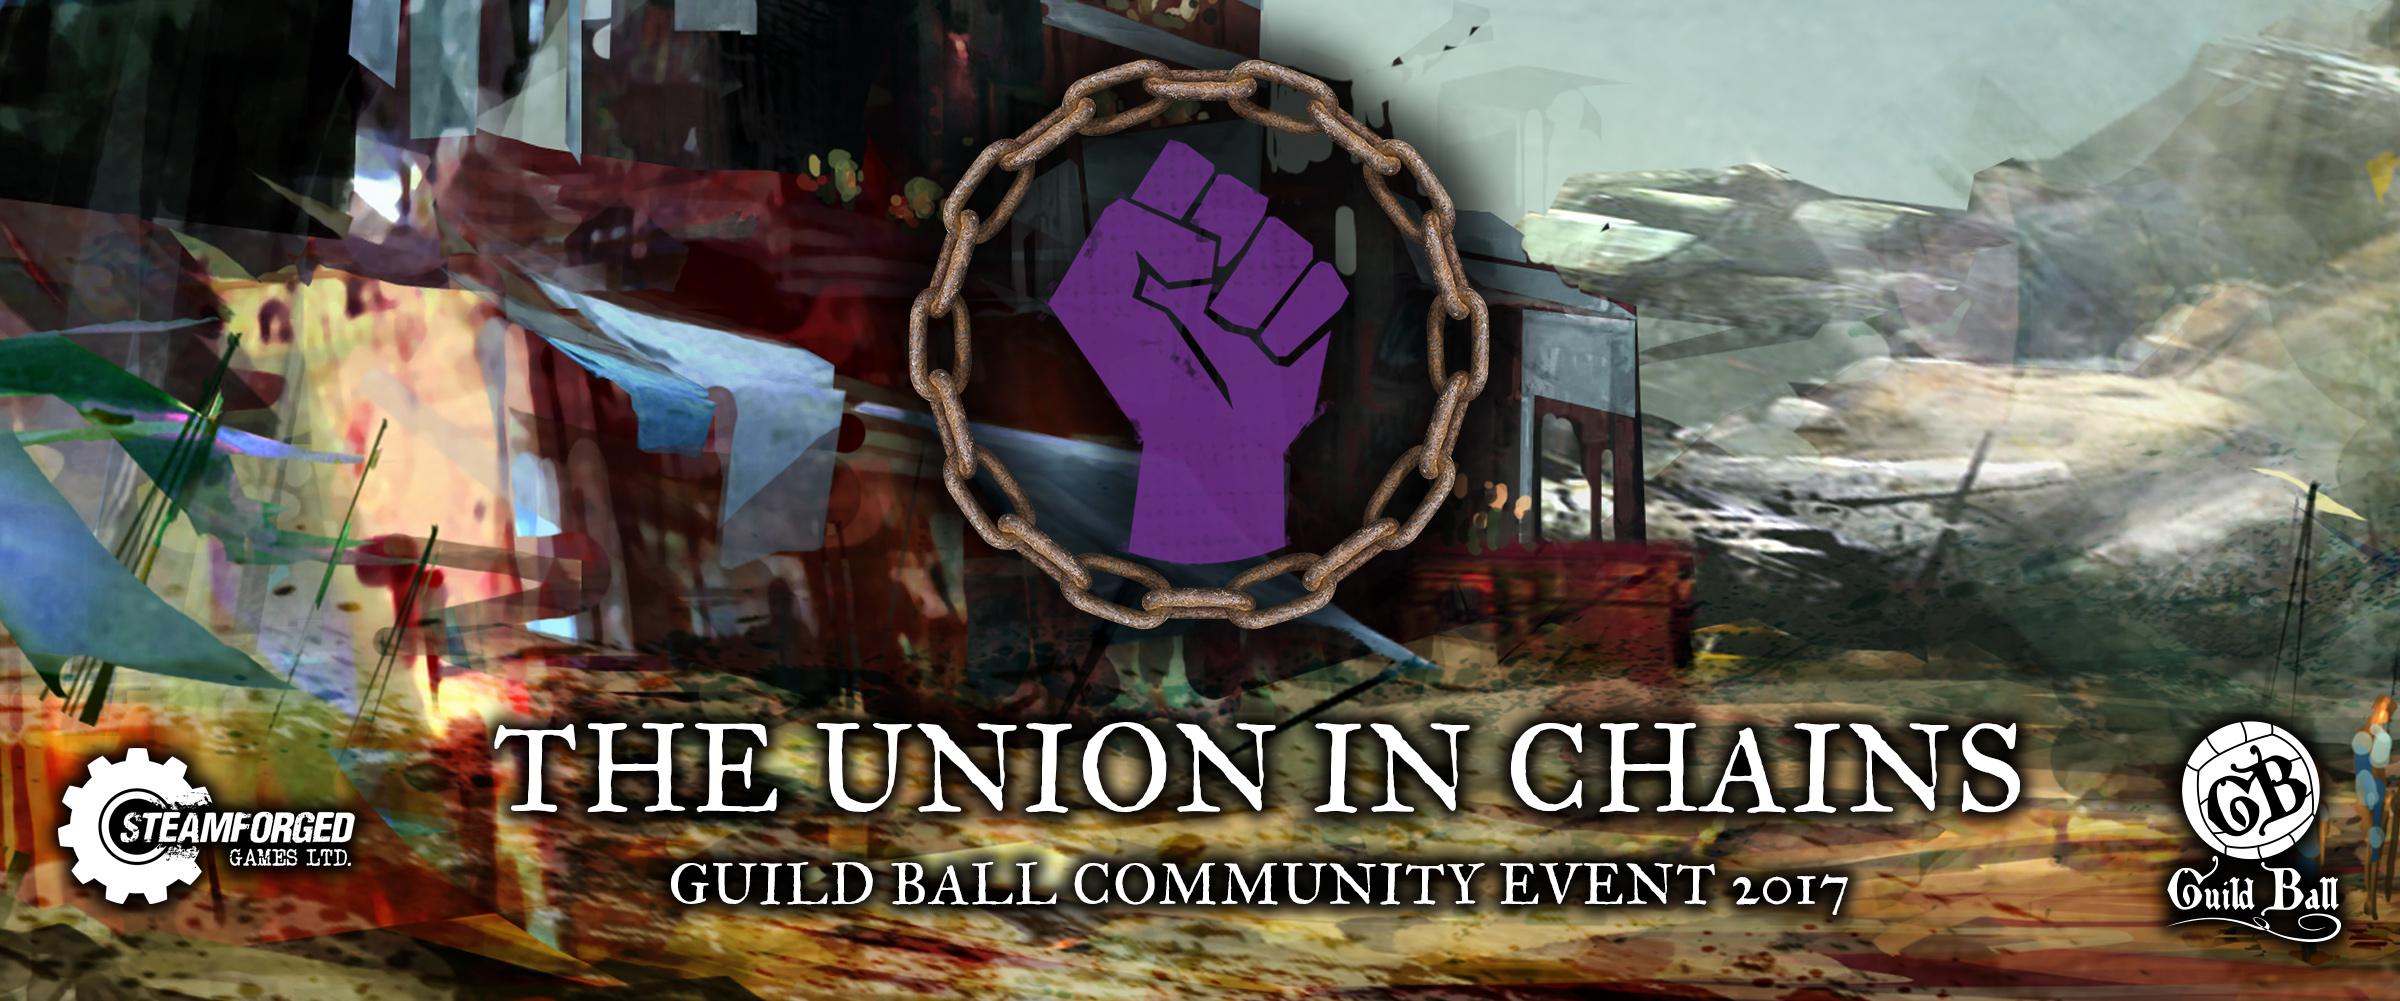 Steamforged_Community_Event_UIC.jpg